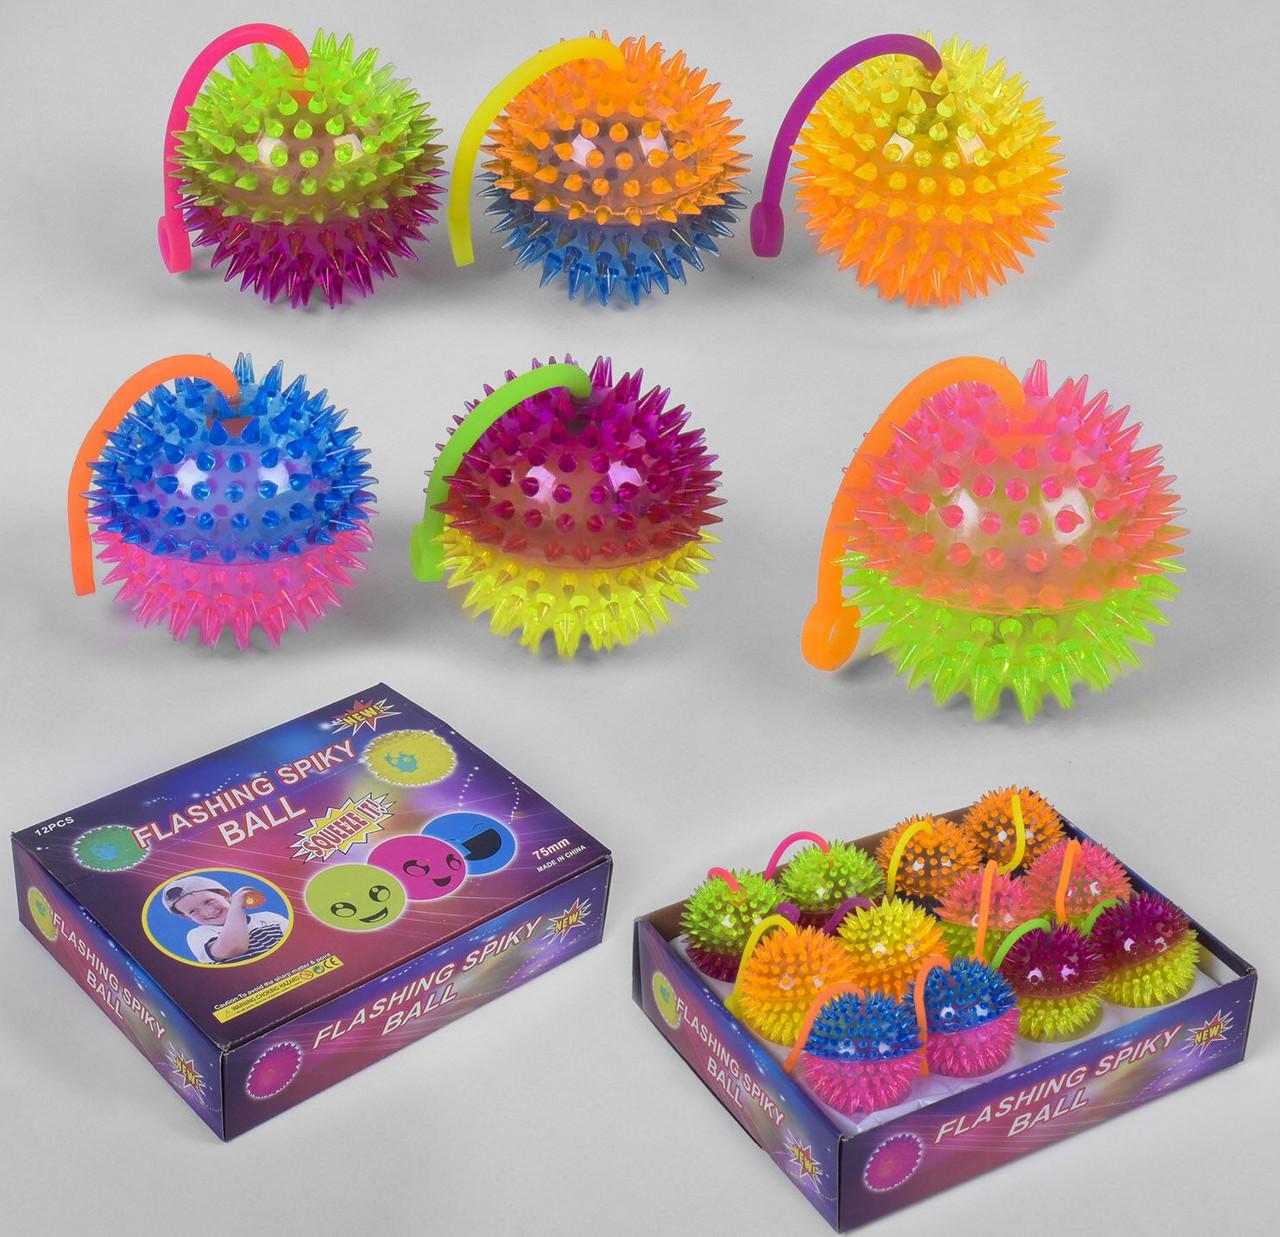 Мяч-прыгун Flashing Spiky Ball свет, пищалка